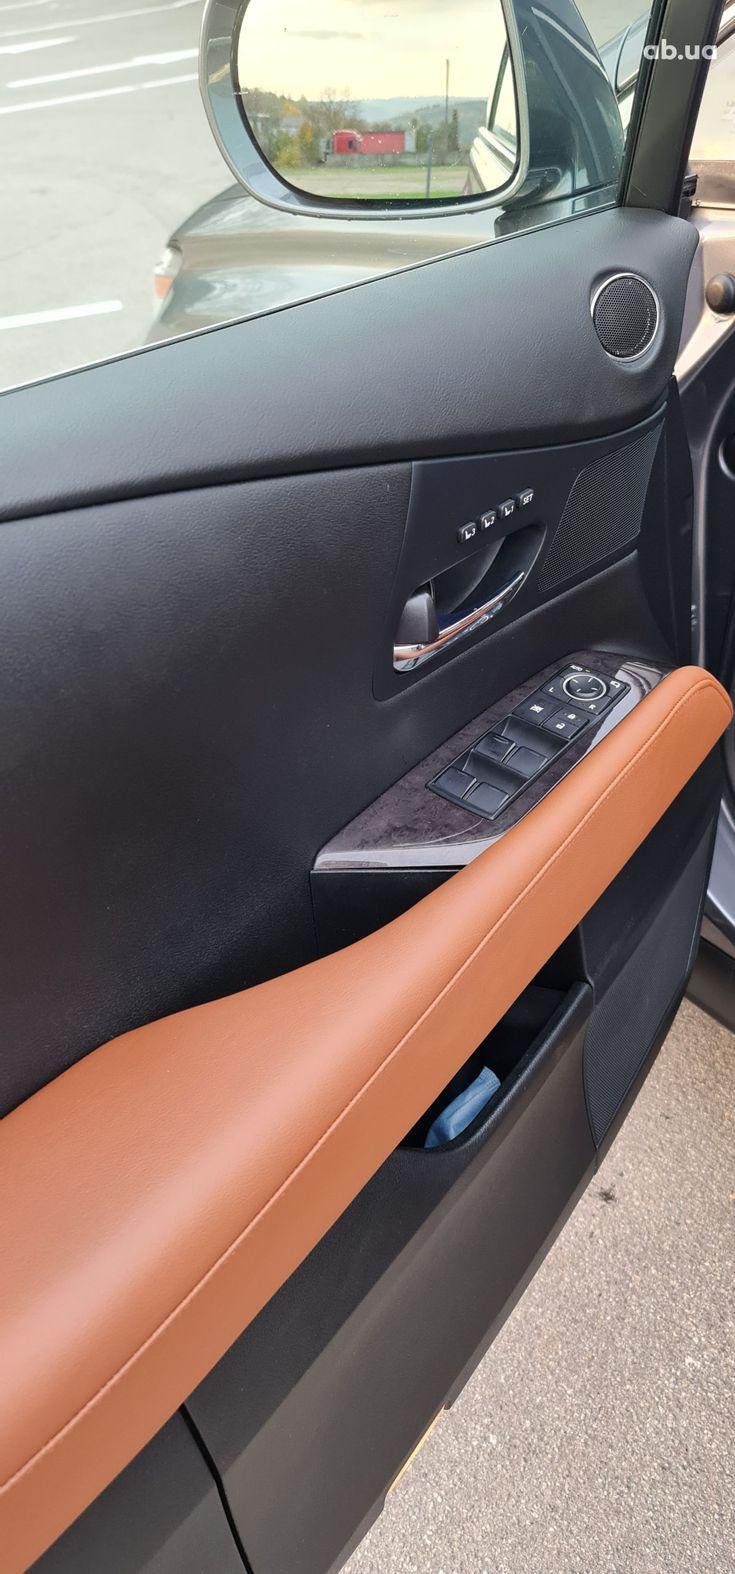 Lexus rx 350 2013 серый - фото 9